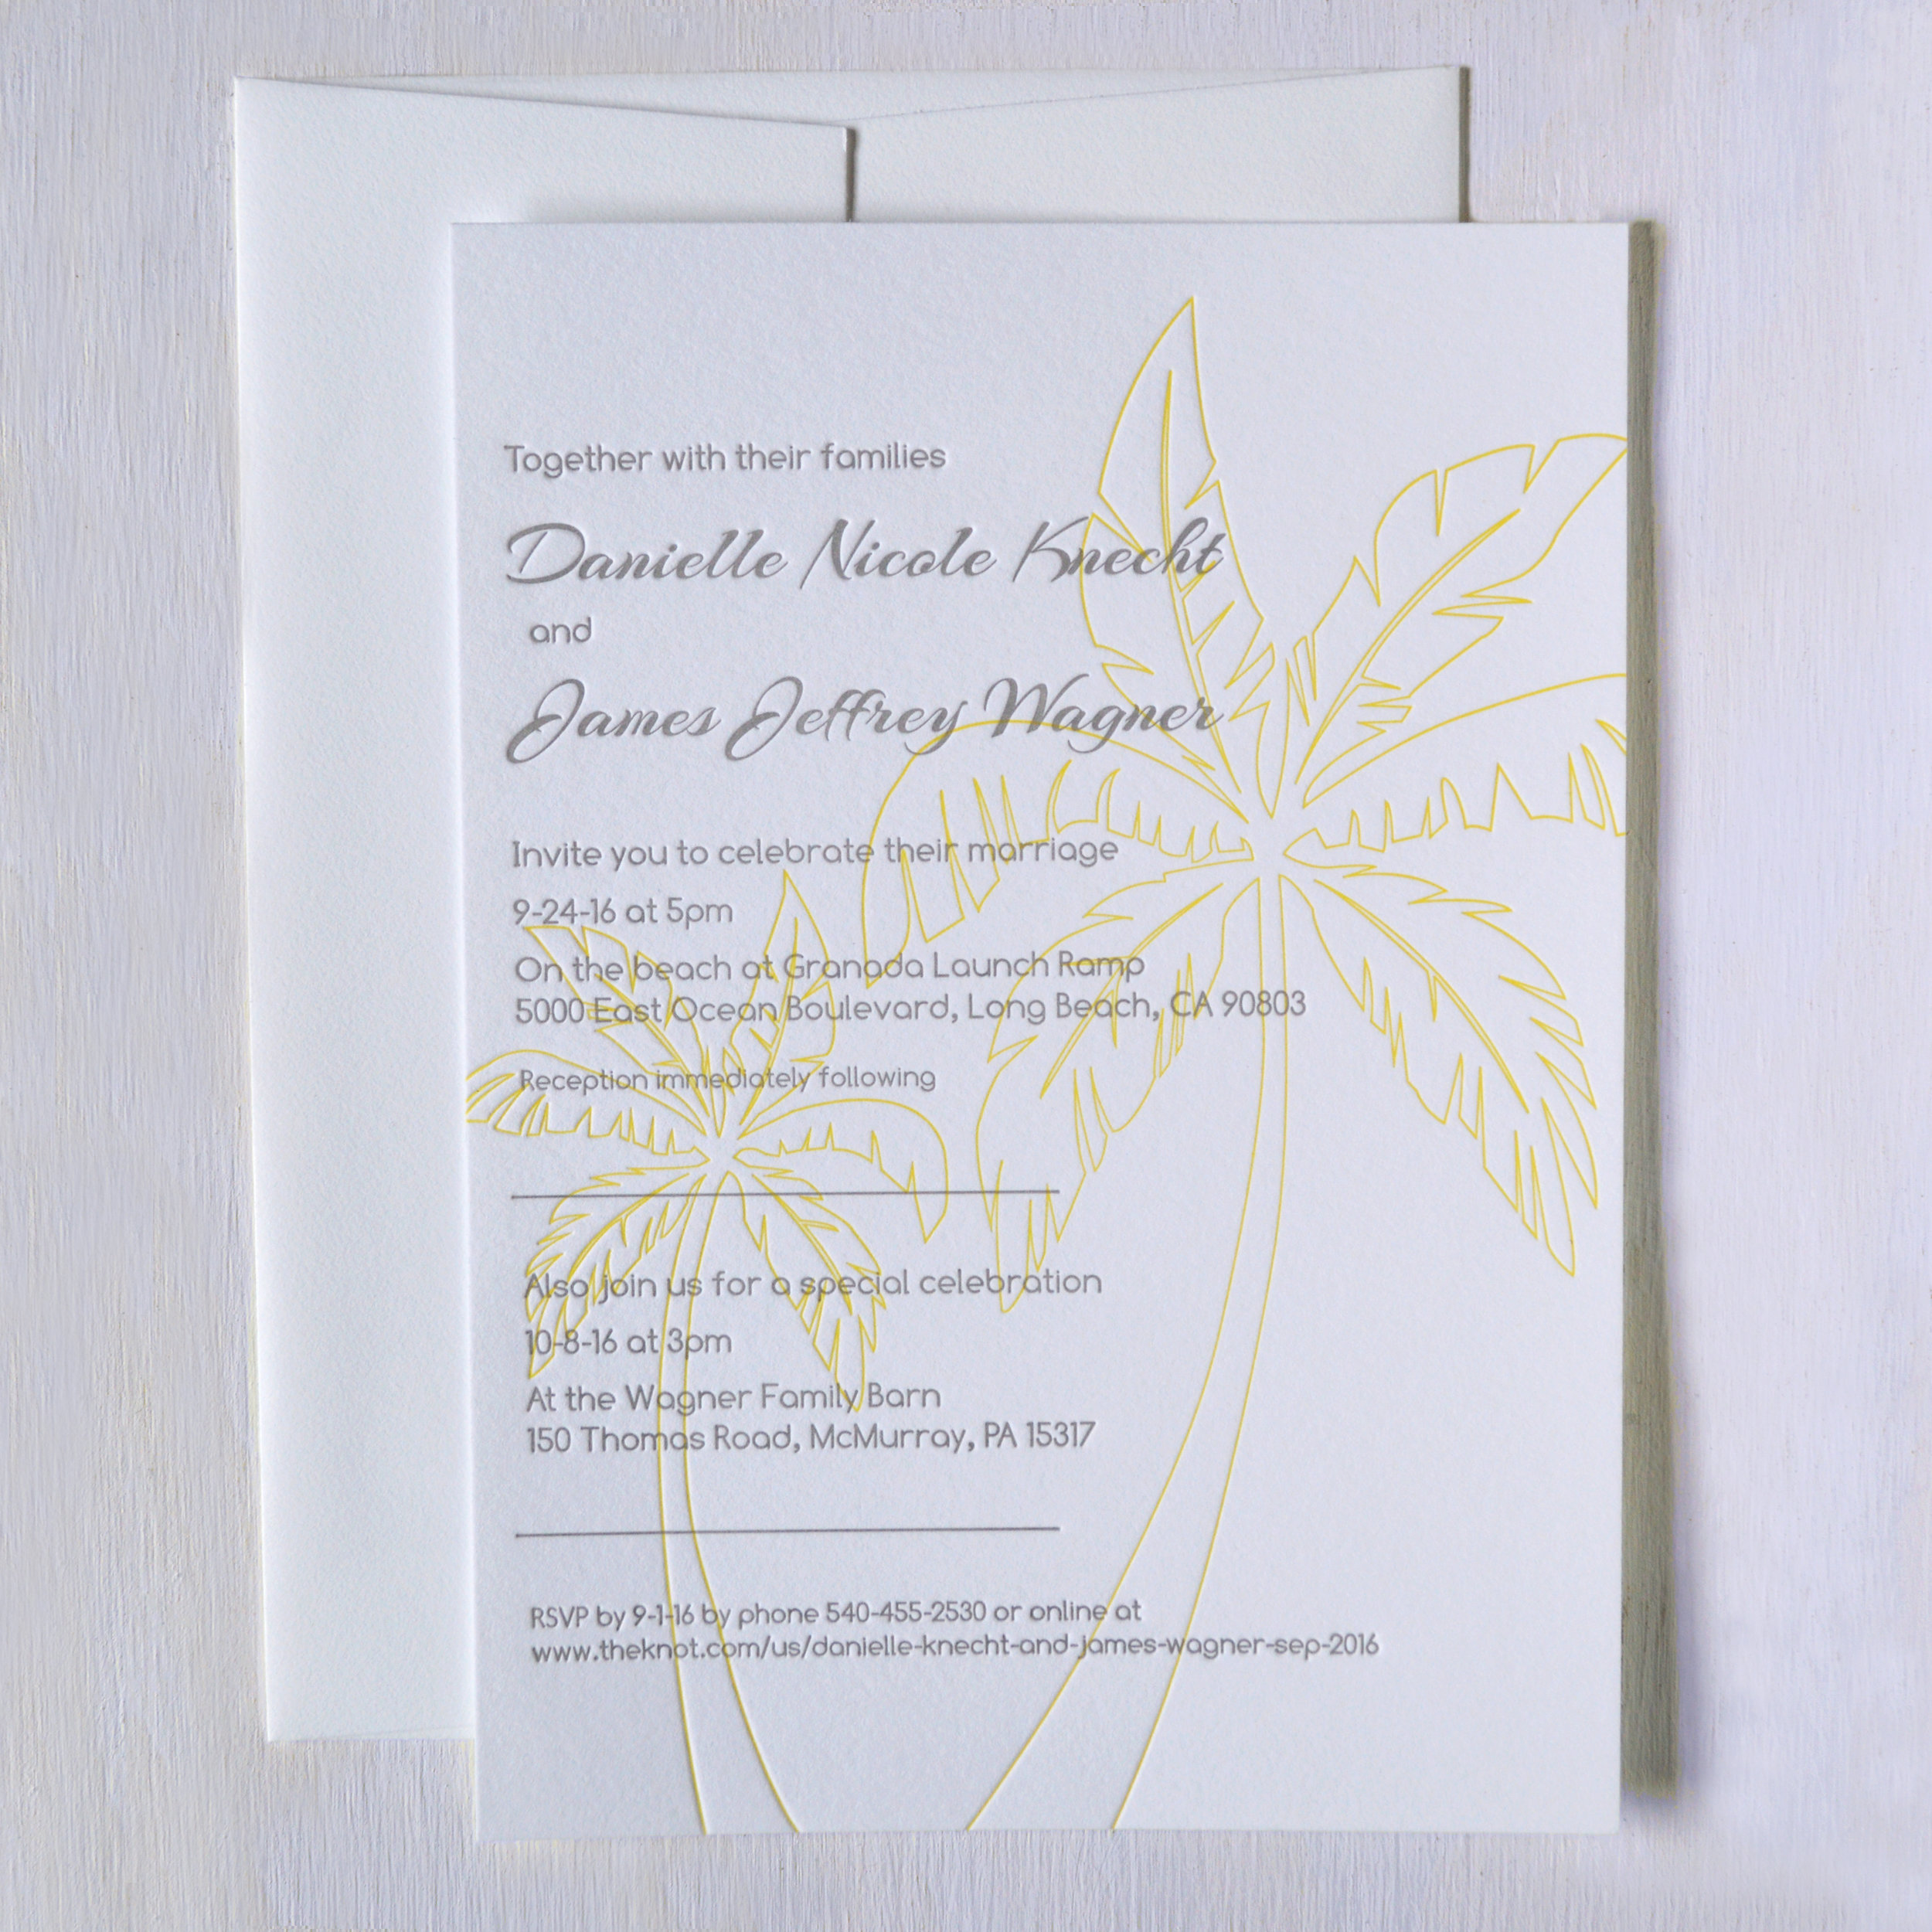 J&D letterpress wedding invitation.jpg